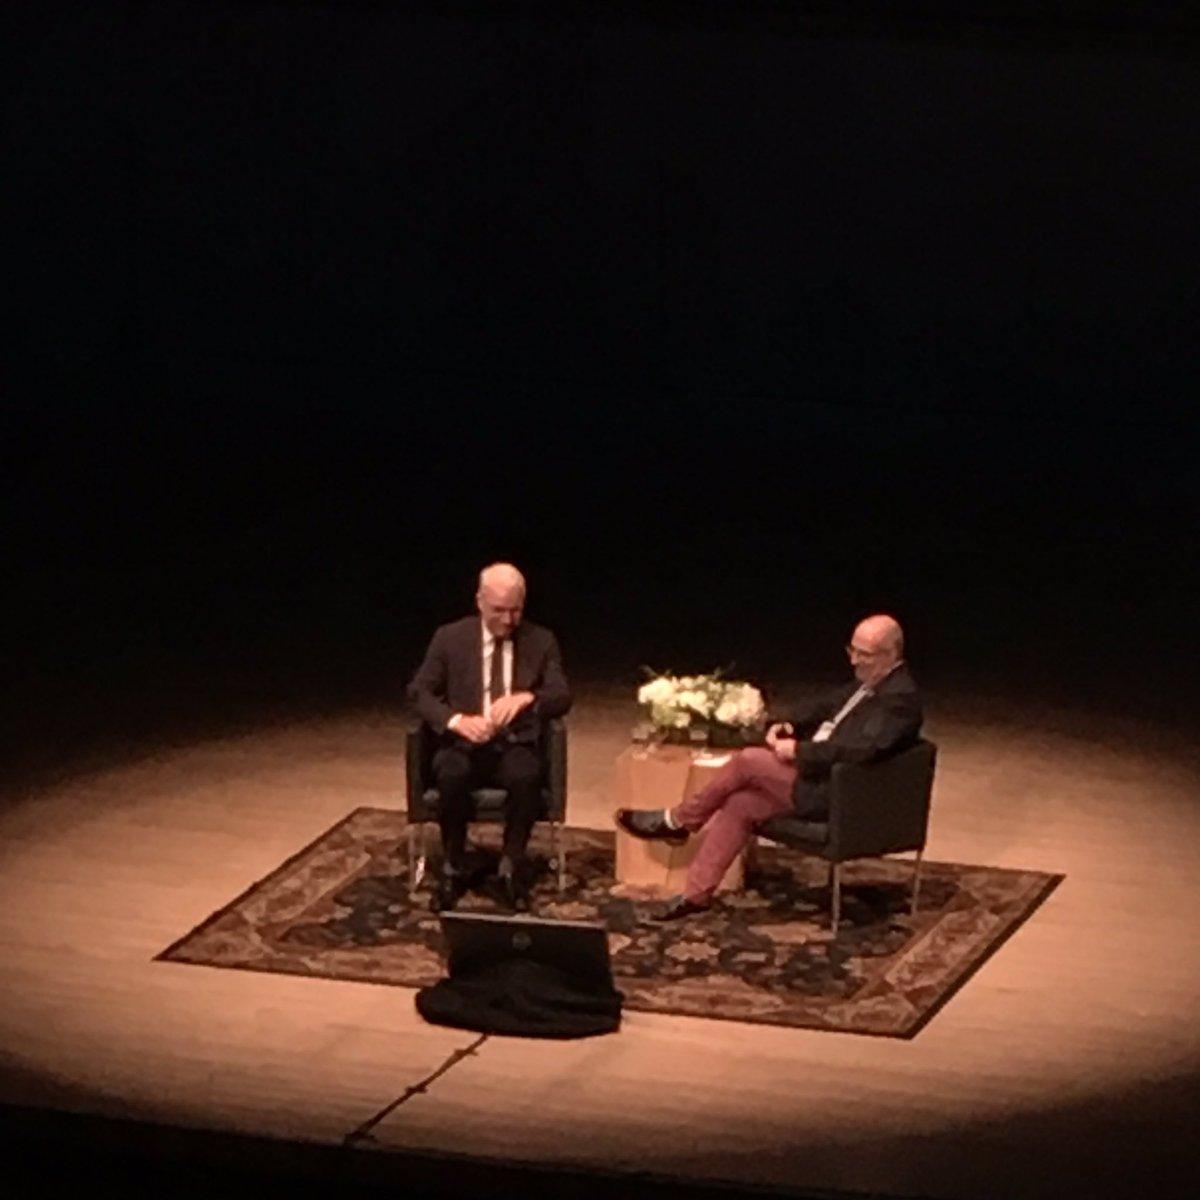 Steve Martin in conversation with @agotoronto curator Andrew Hunter. Part art talk, part standup show. #HarrisAGO https://t.co/eJrsqP6hWI